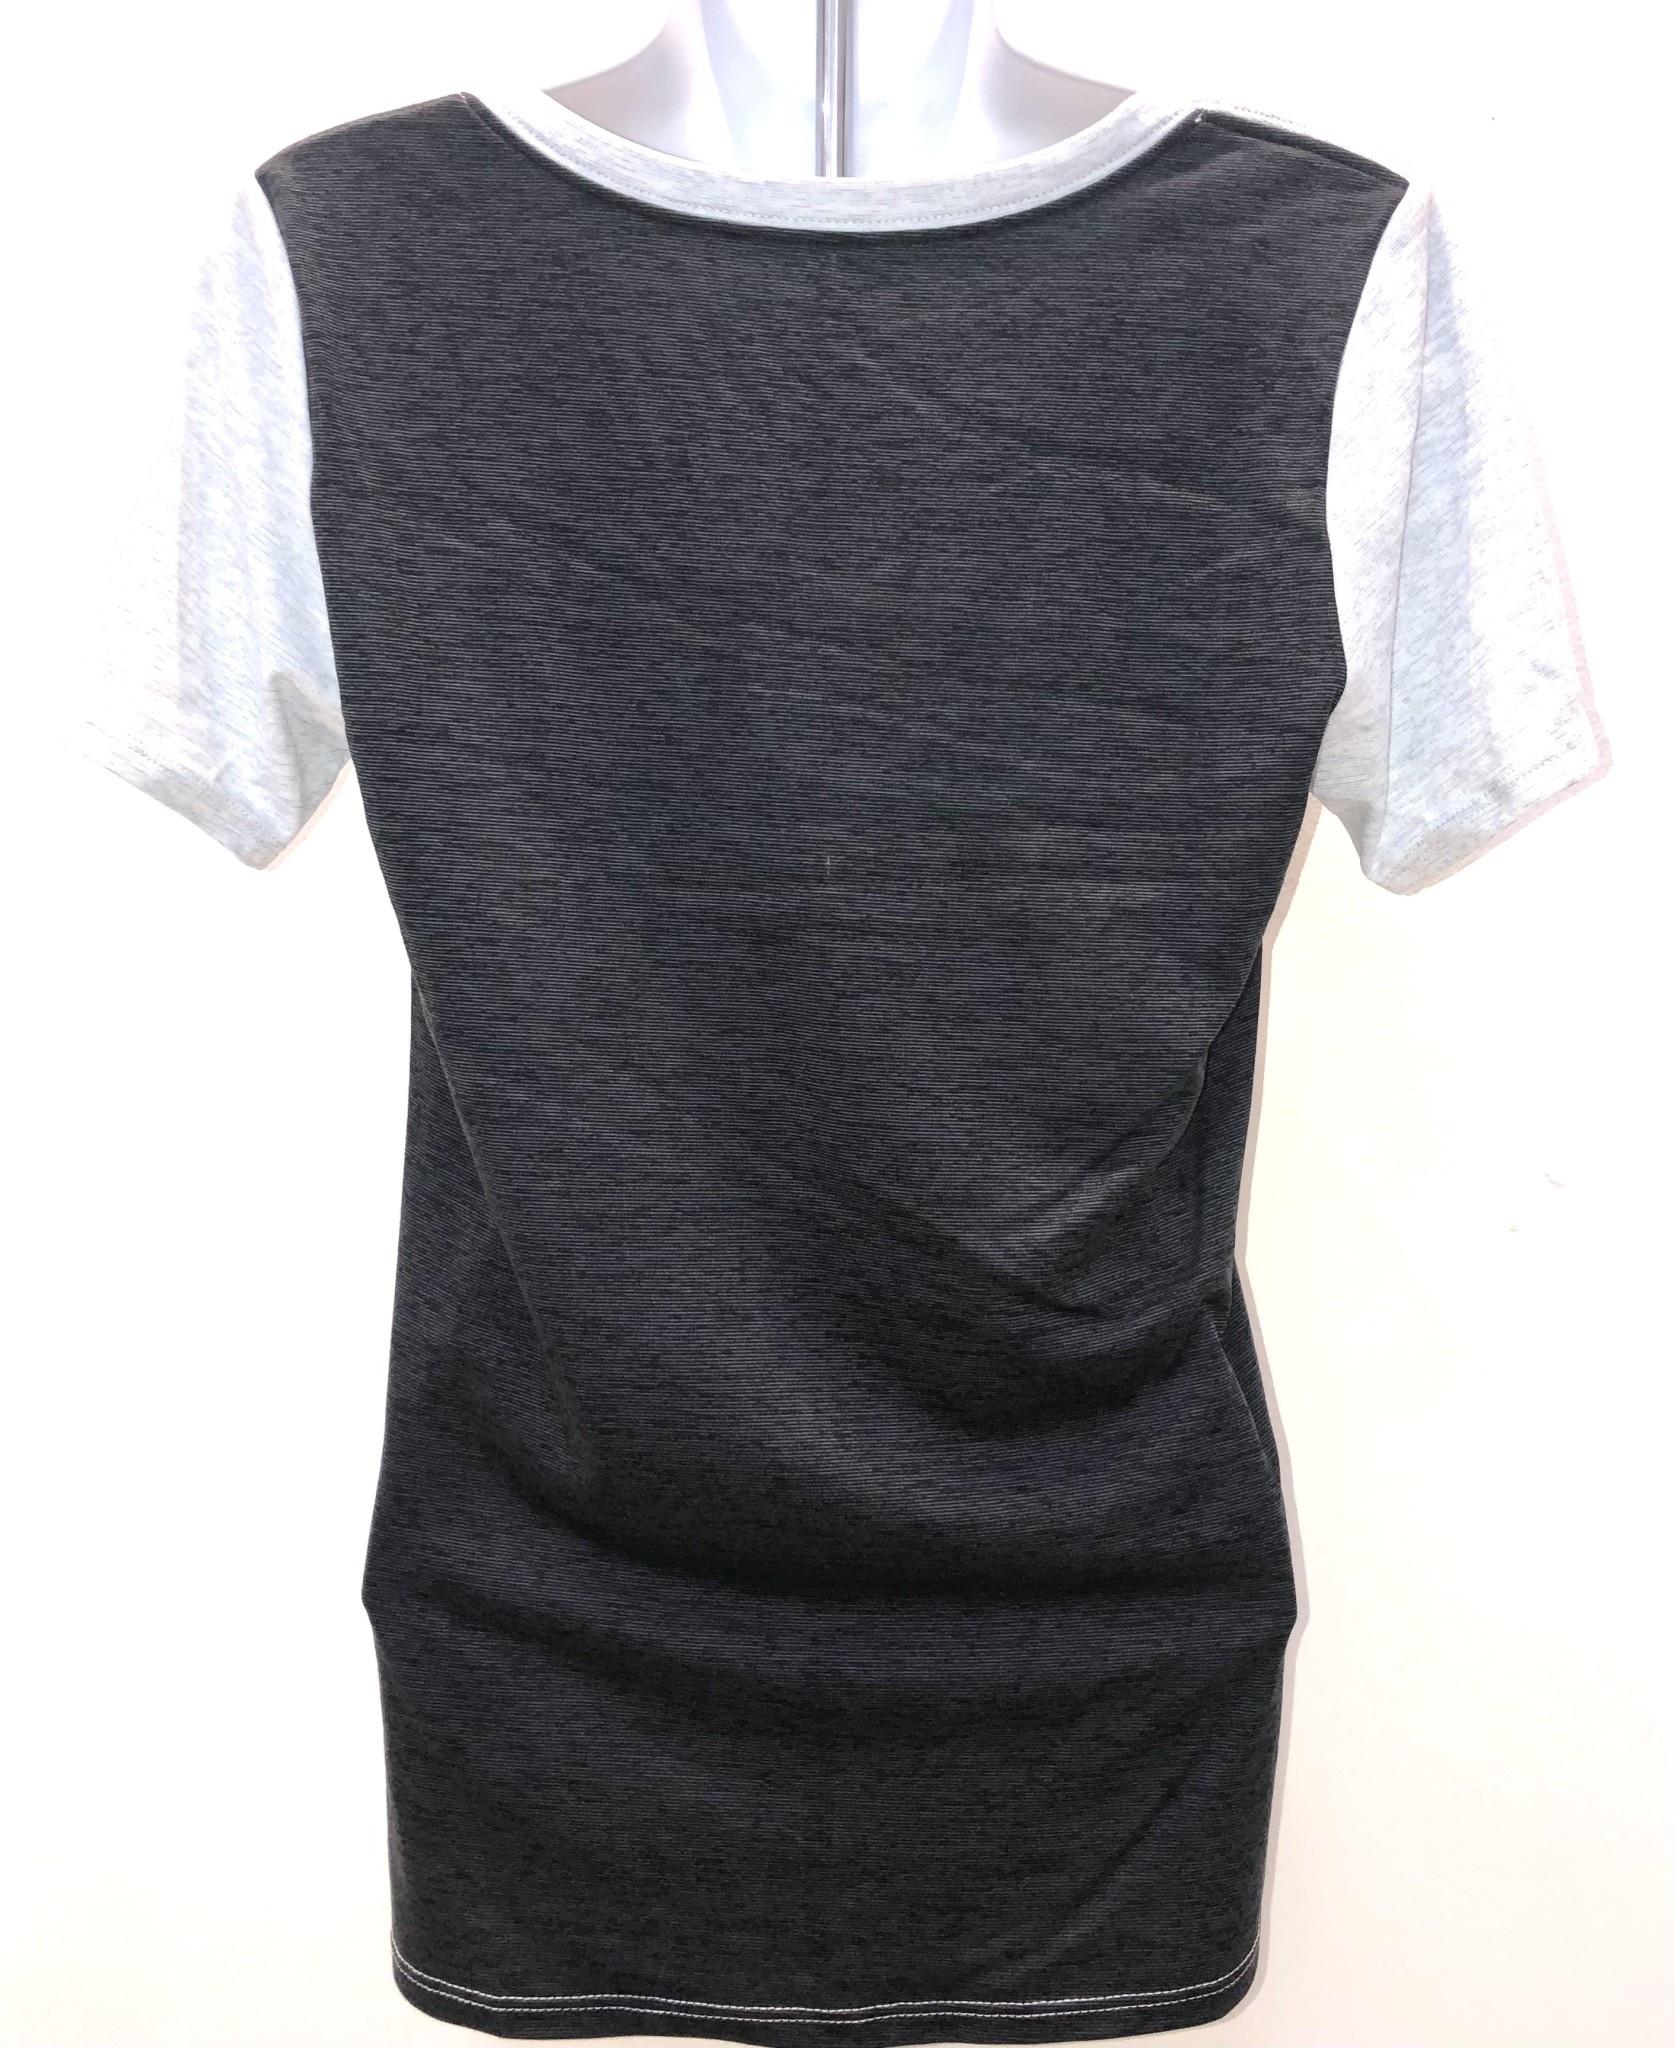 Nike T: Nike Women's Dri-fit Vneck Light Gray (Dark Gray on Back) with W